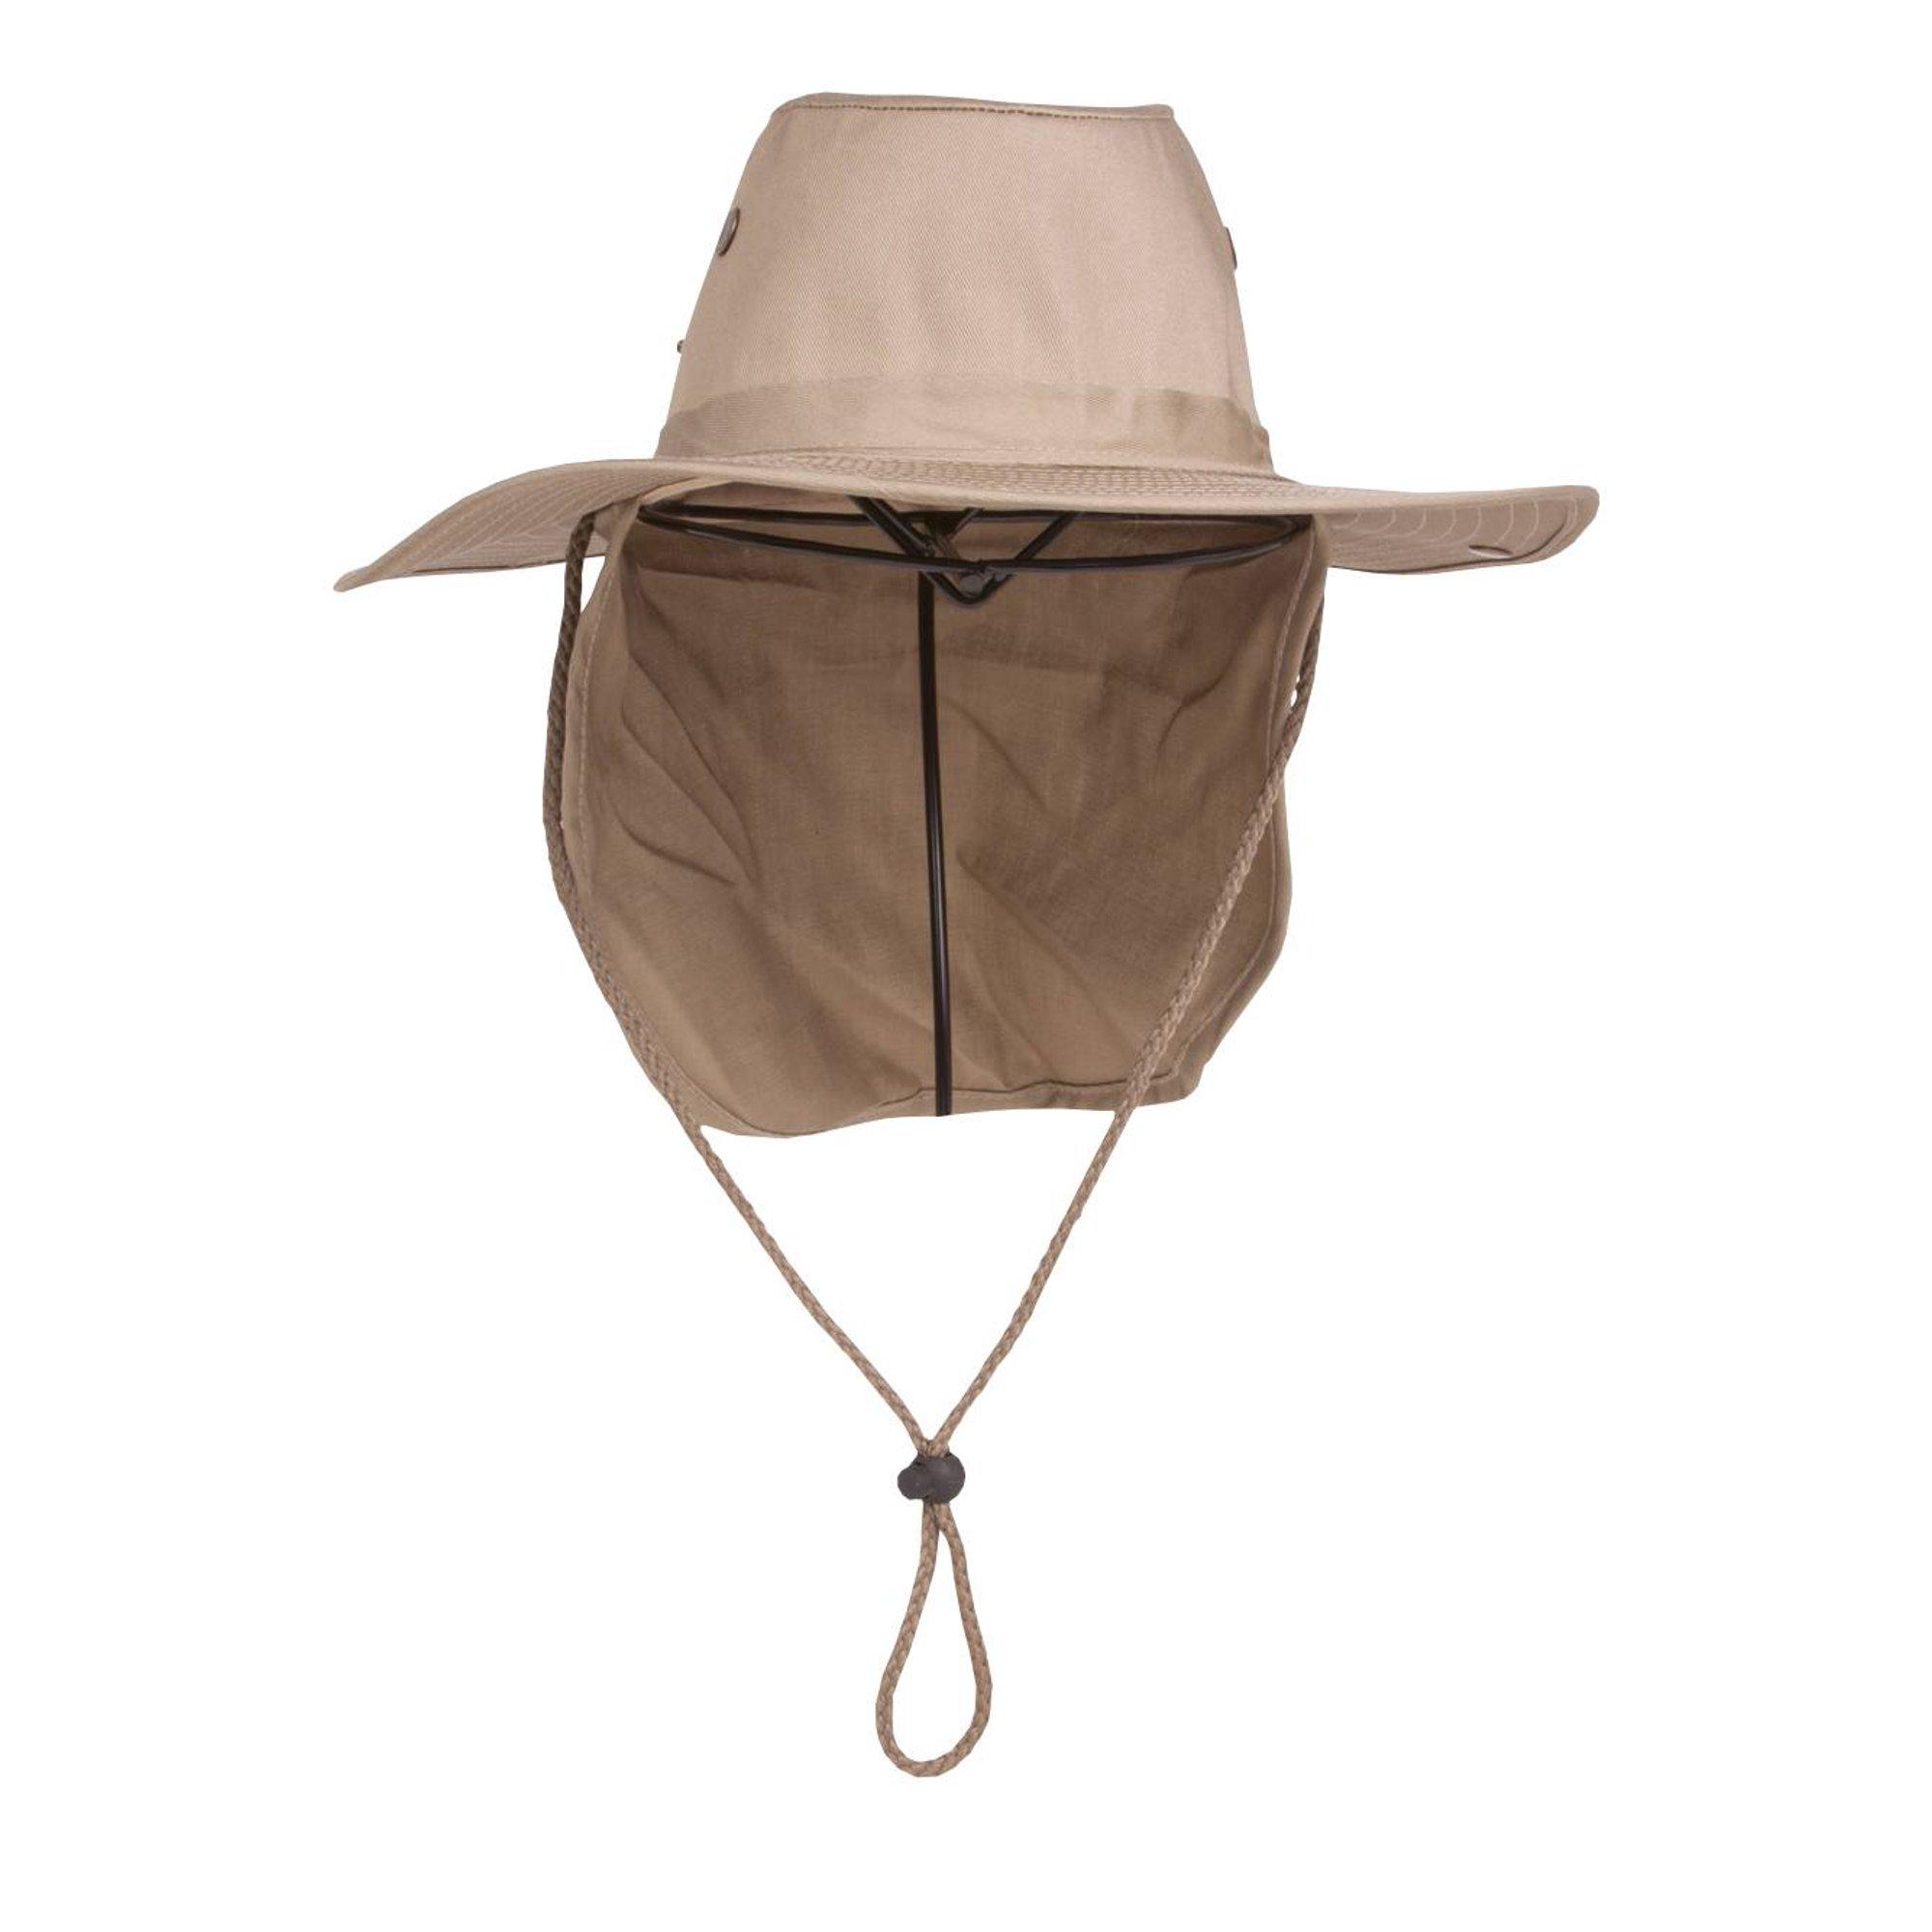 27d2eaf1c Top Headwear Safari Explorer Bucket Hat With Flap Neck Cover - Beige, XL